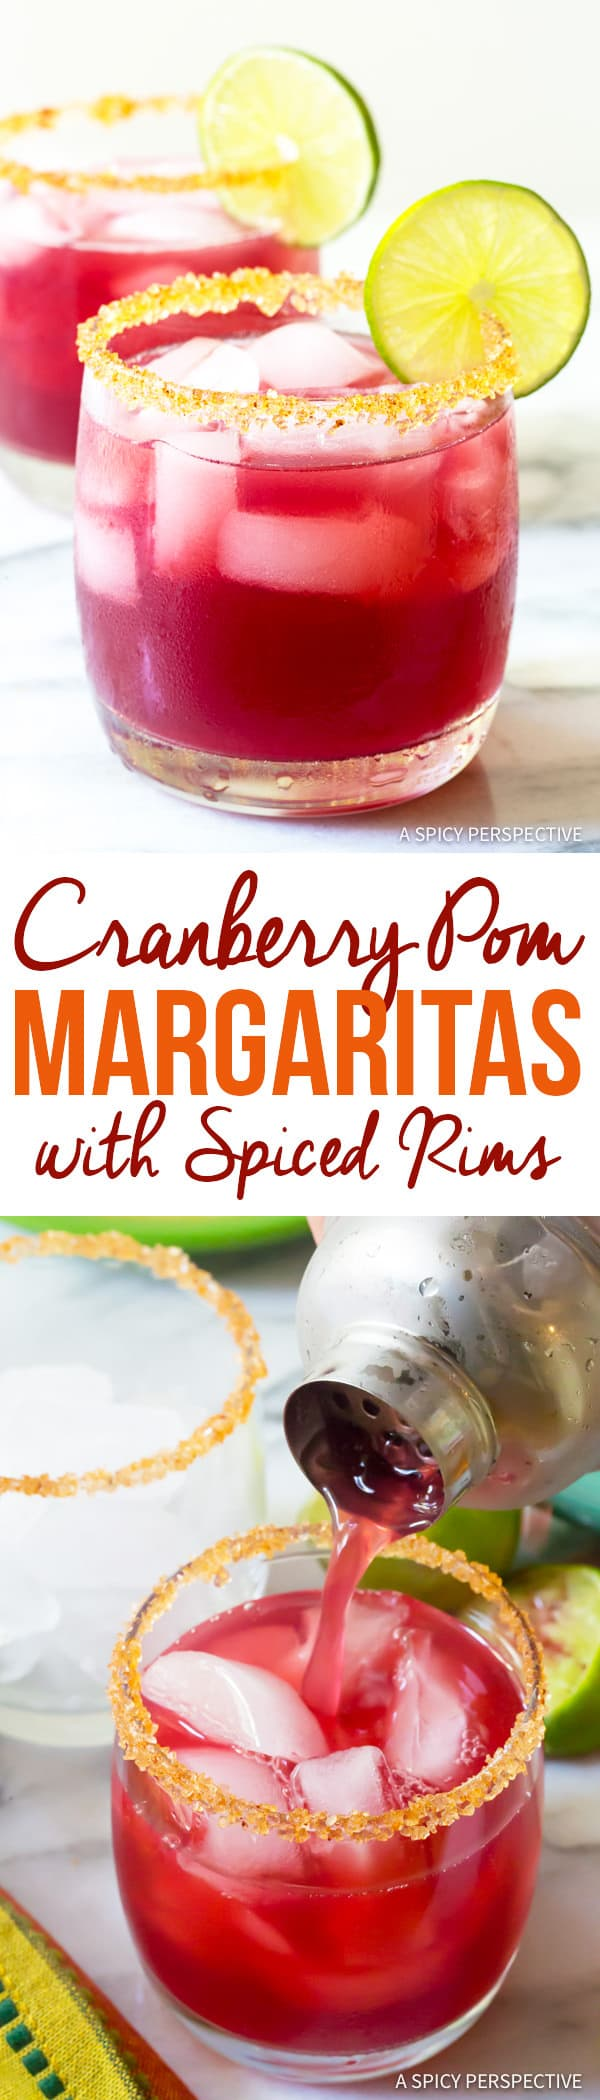 Dazzling Cranberry Pomegranate Margarita with Spiced Rim Recipe   ASpicyPerspective.com